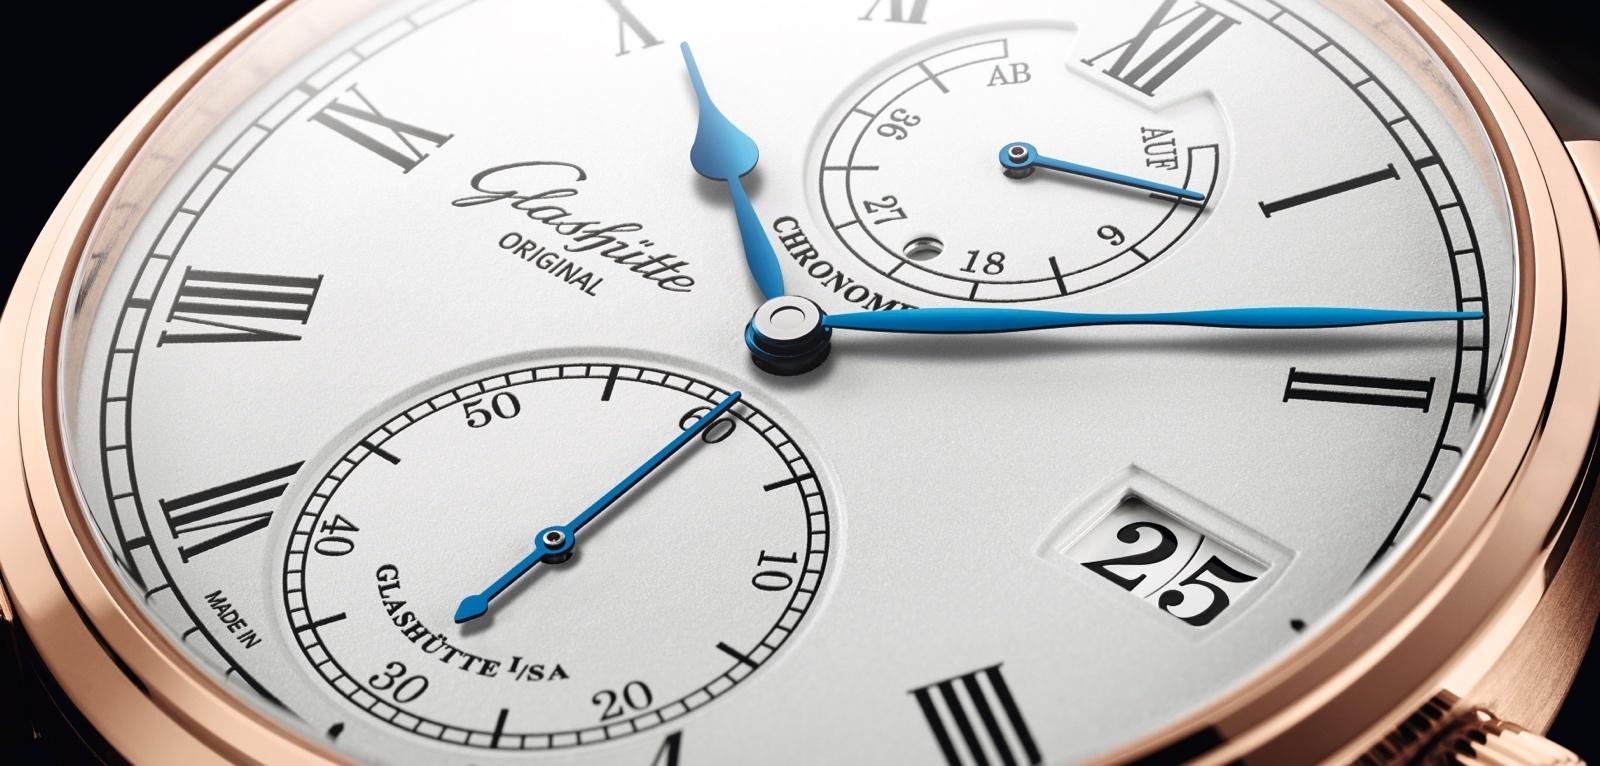 Nueva referencia para el Senator Chronometer de Glashütte Original